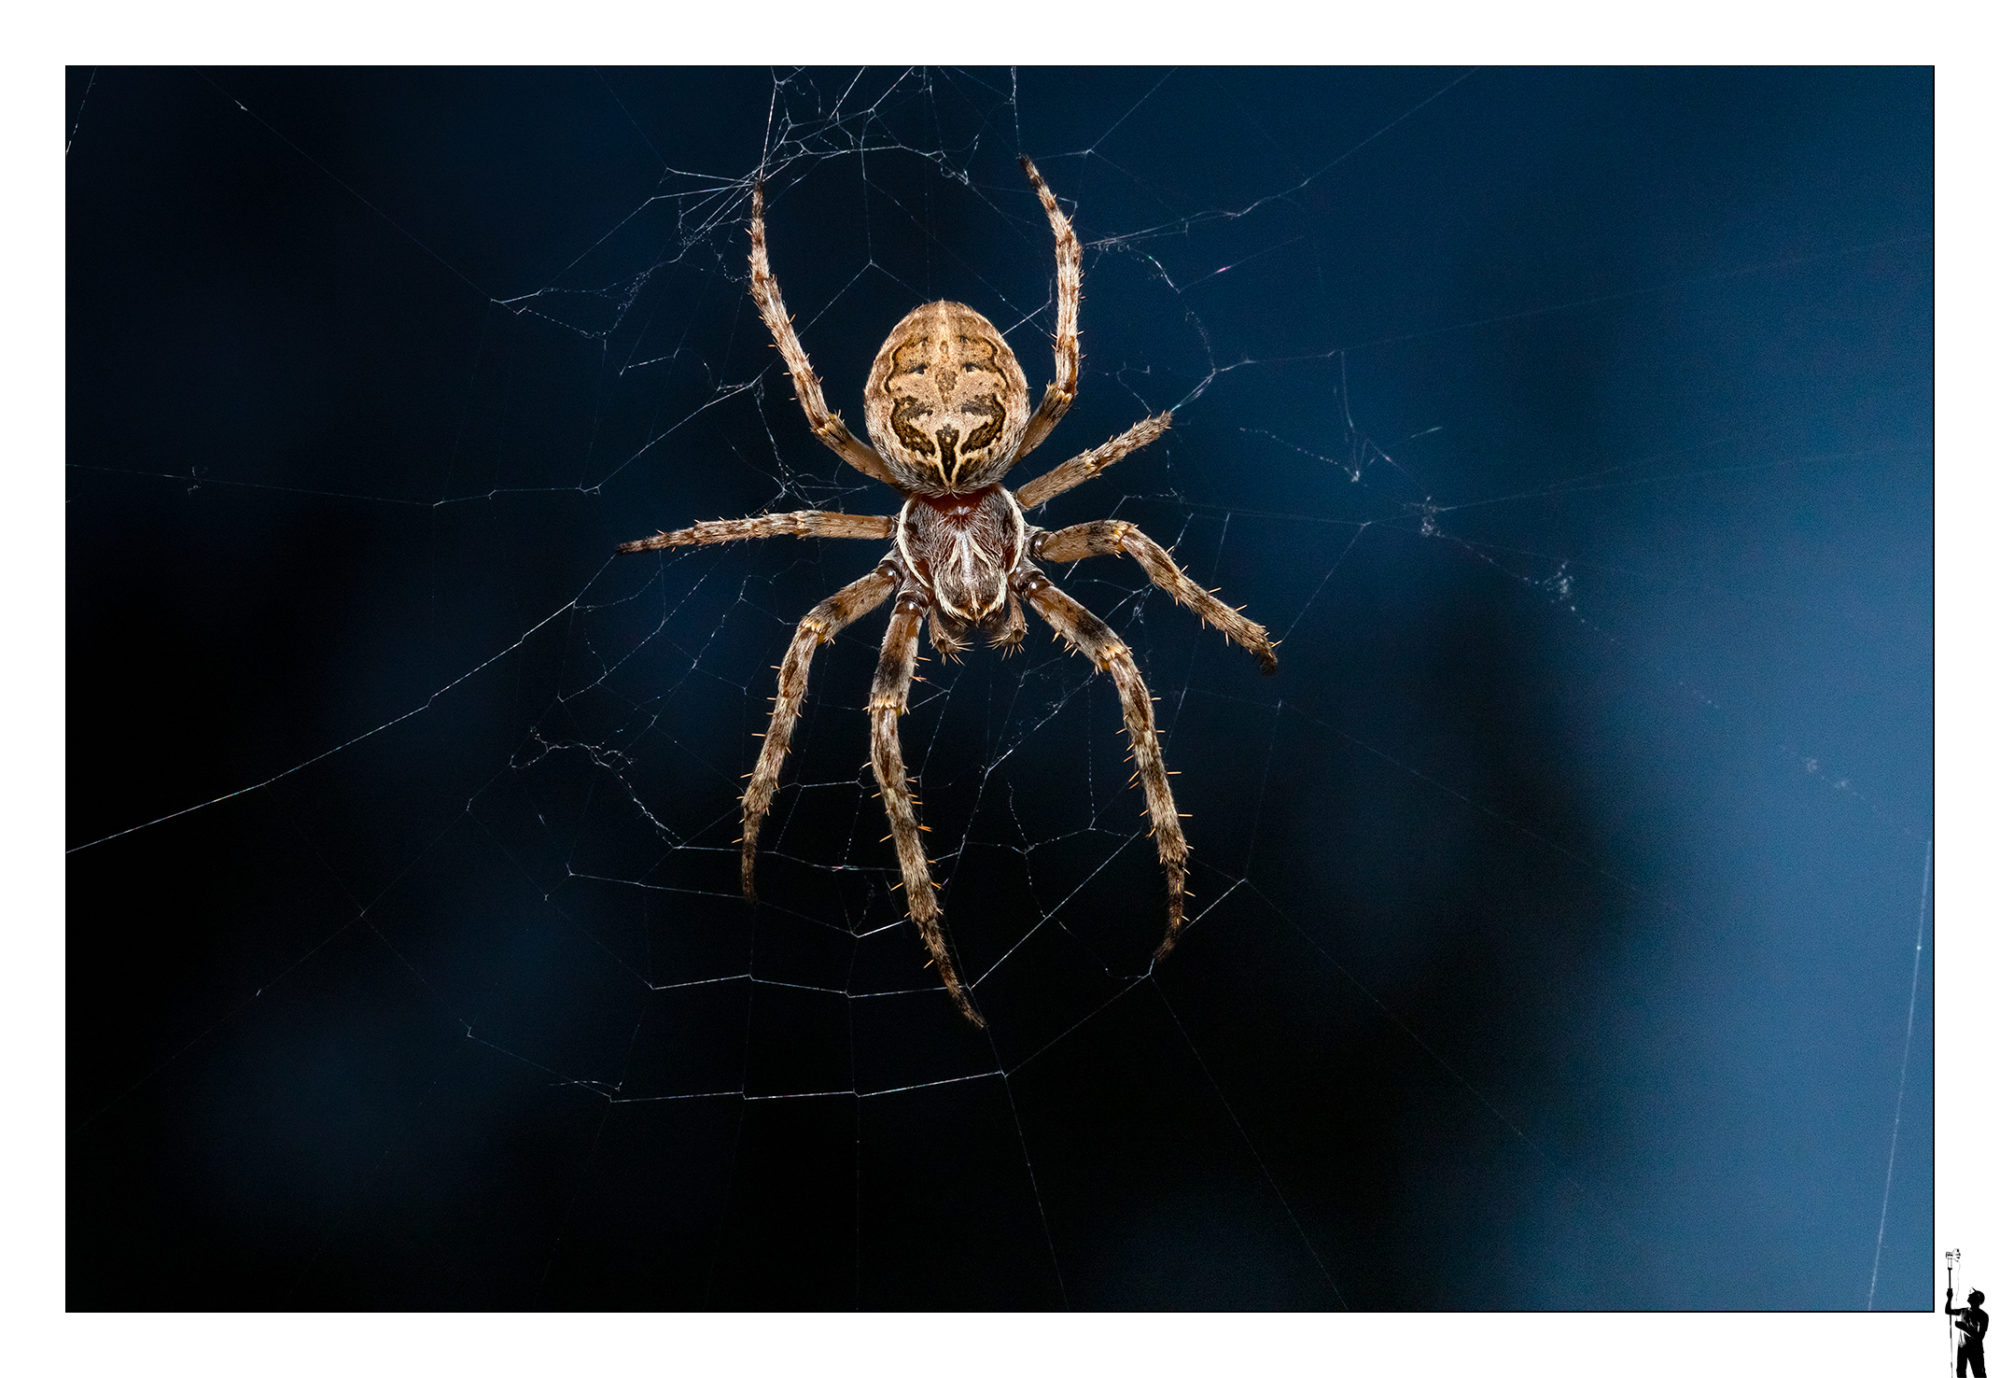 grosse araignée suisse au flash et objectif macro